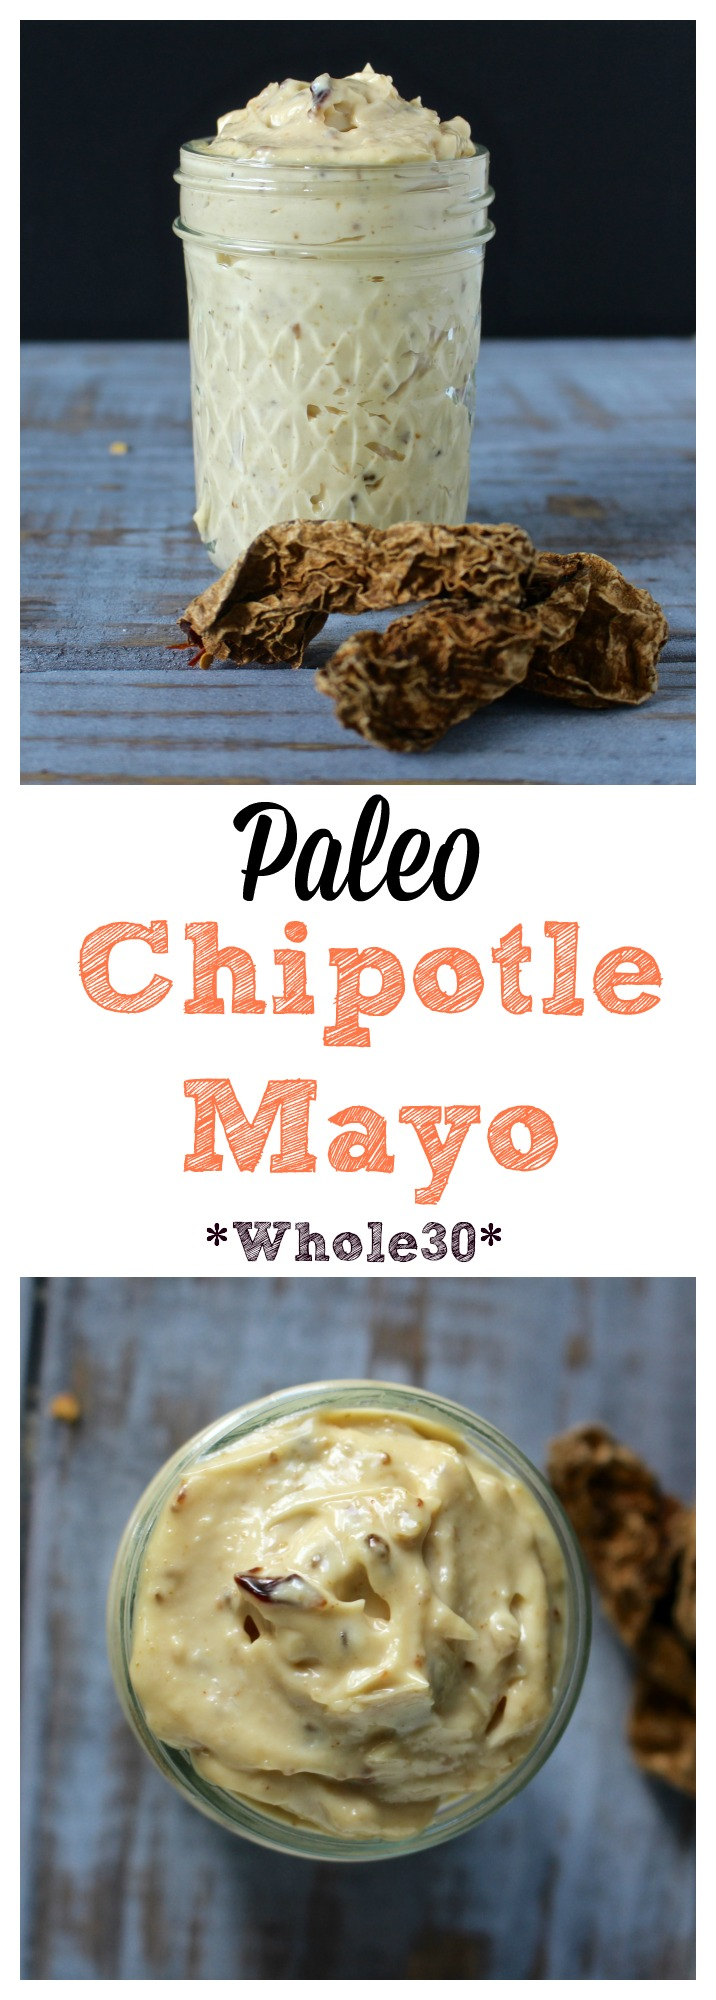 Paleo Chipotle Mayo